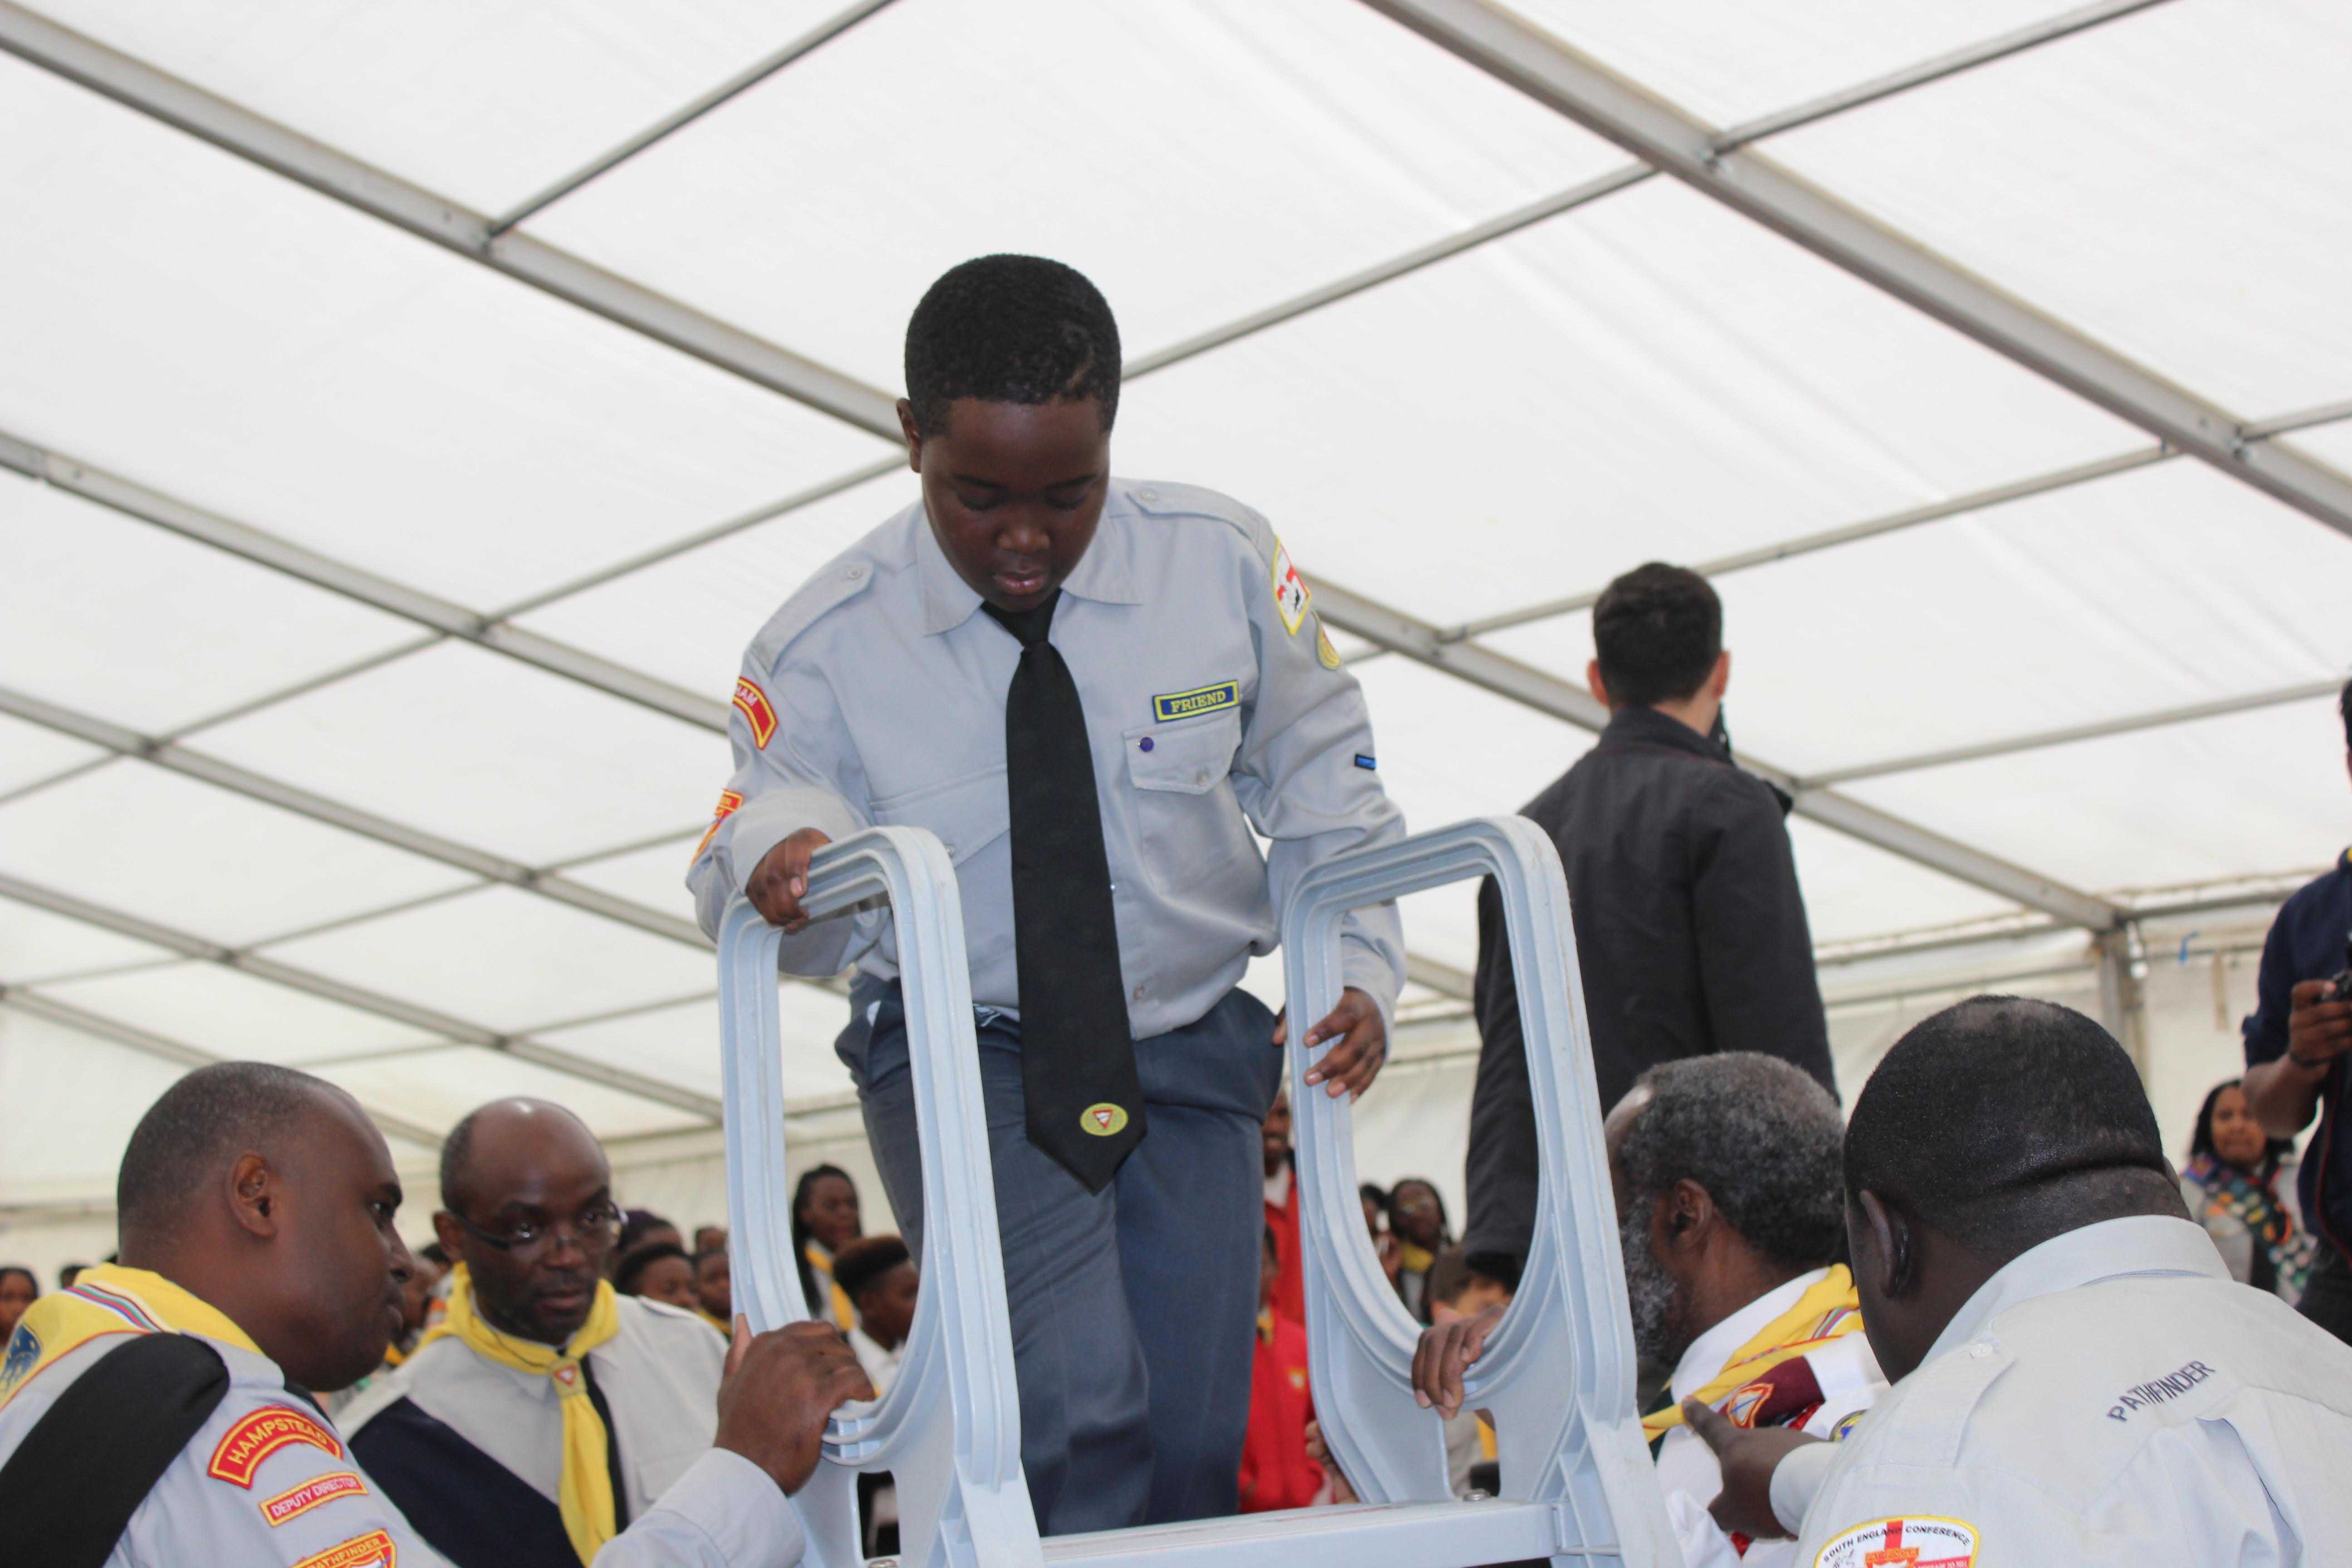 Balham Seventh-day Adventist Church - Viewing: Photo